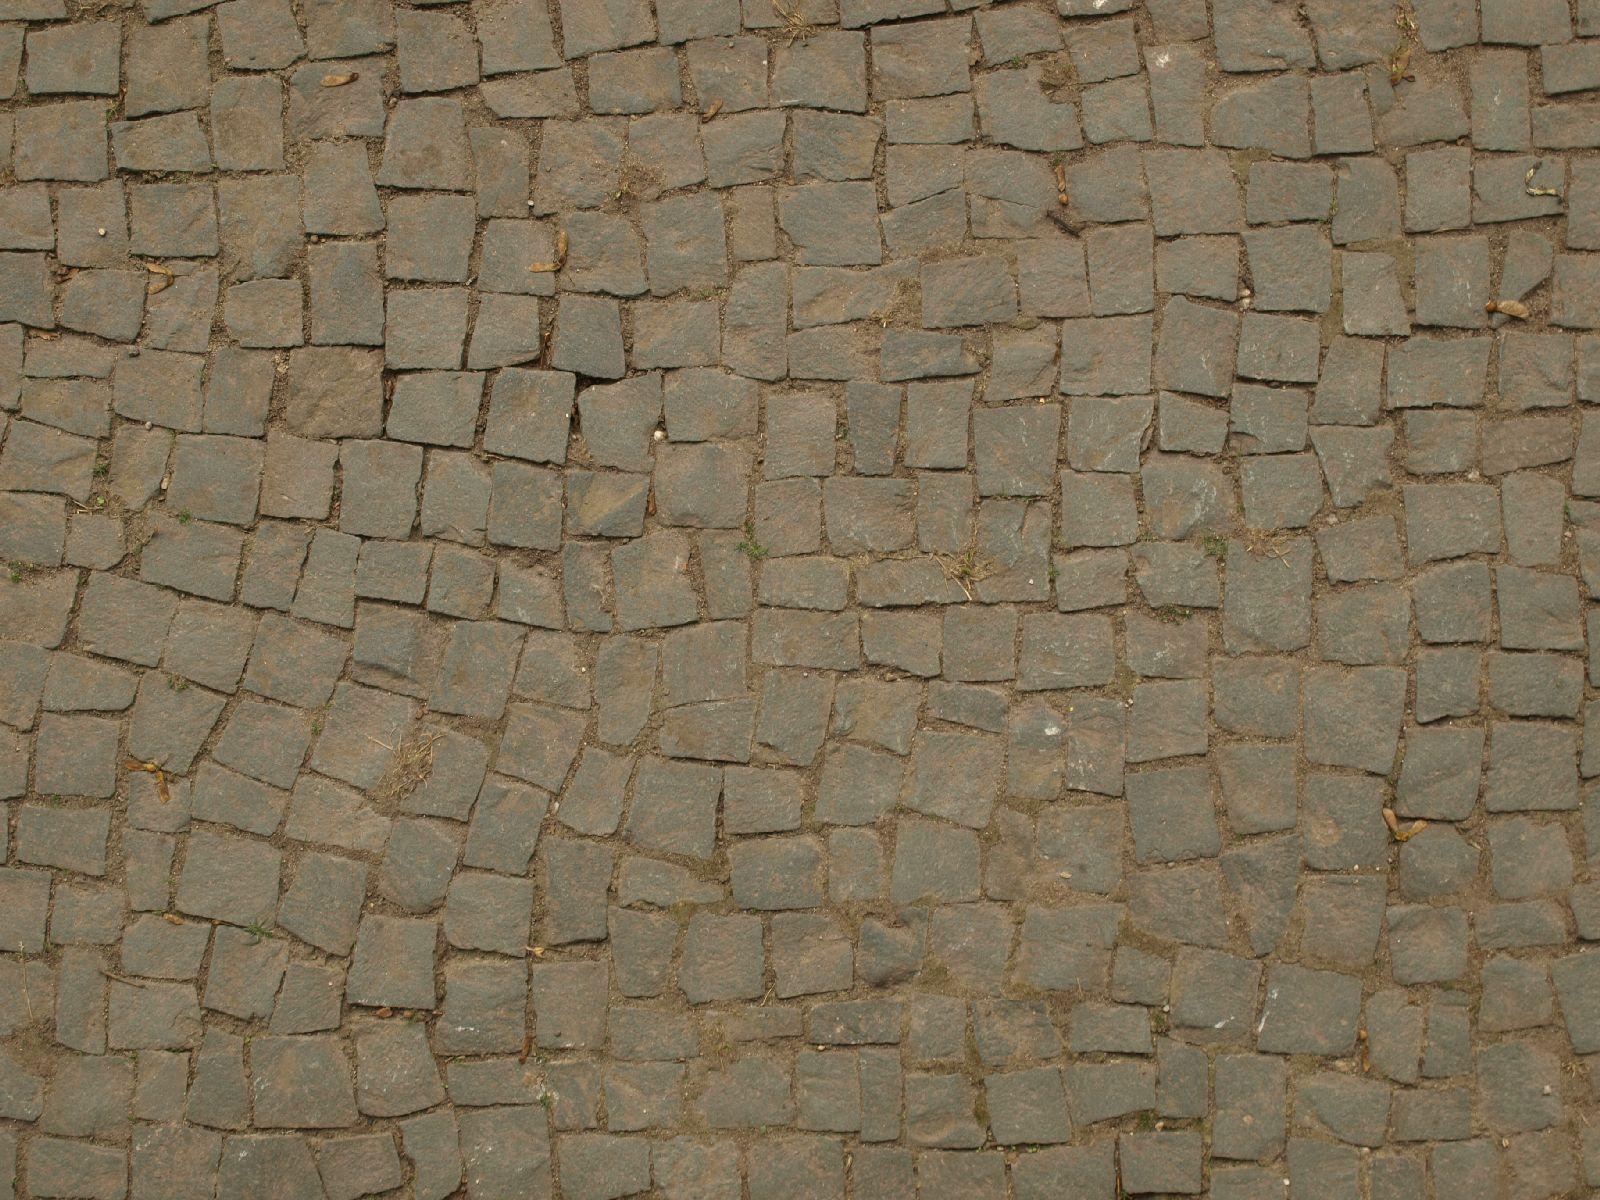 Ground-Urban_Texture_A_PA039931